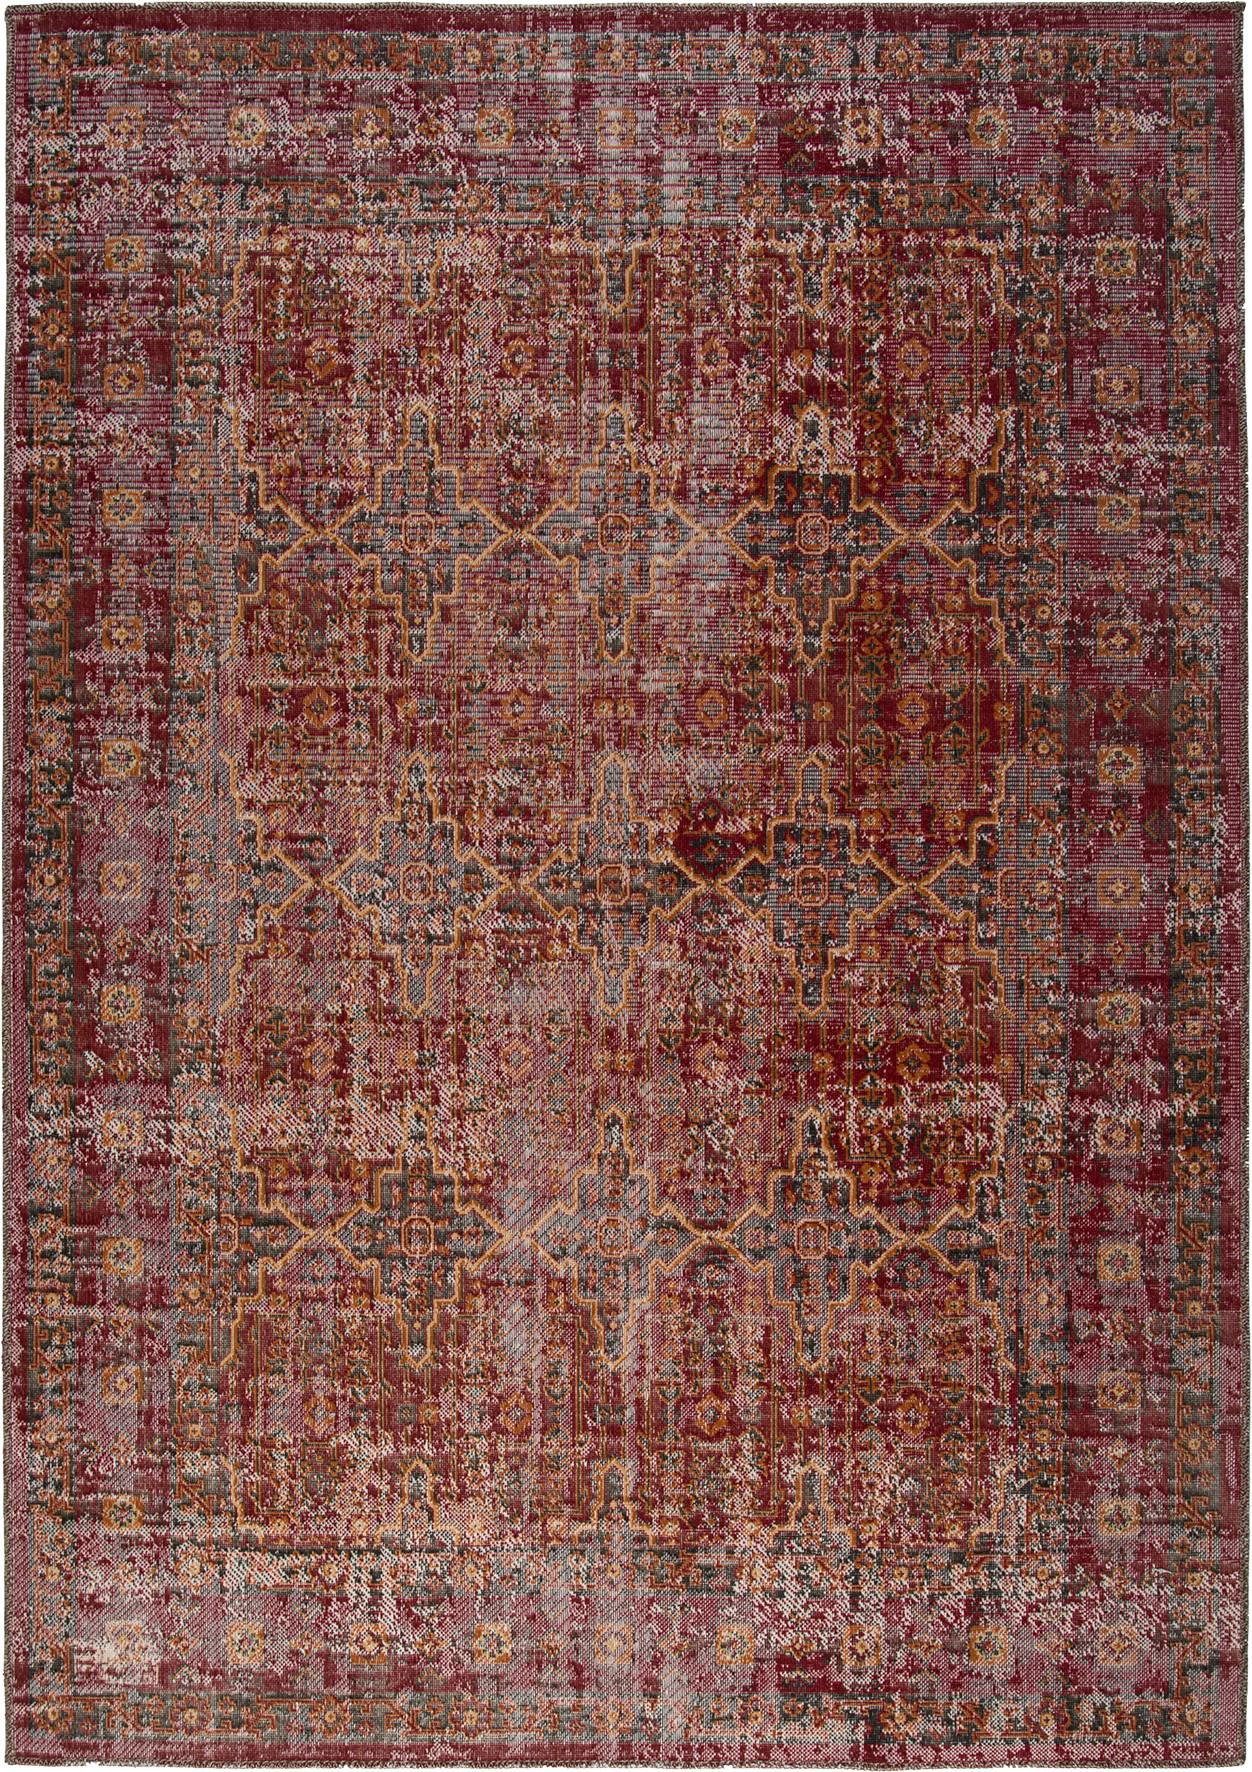 Obsession koberce Kusový koberec Tilas 243 Red - 80x150 cm Expres